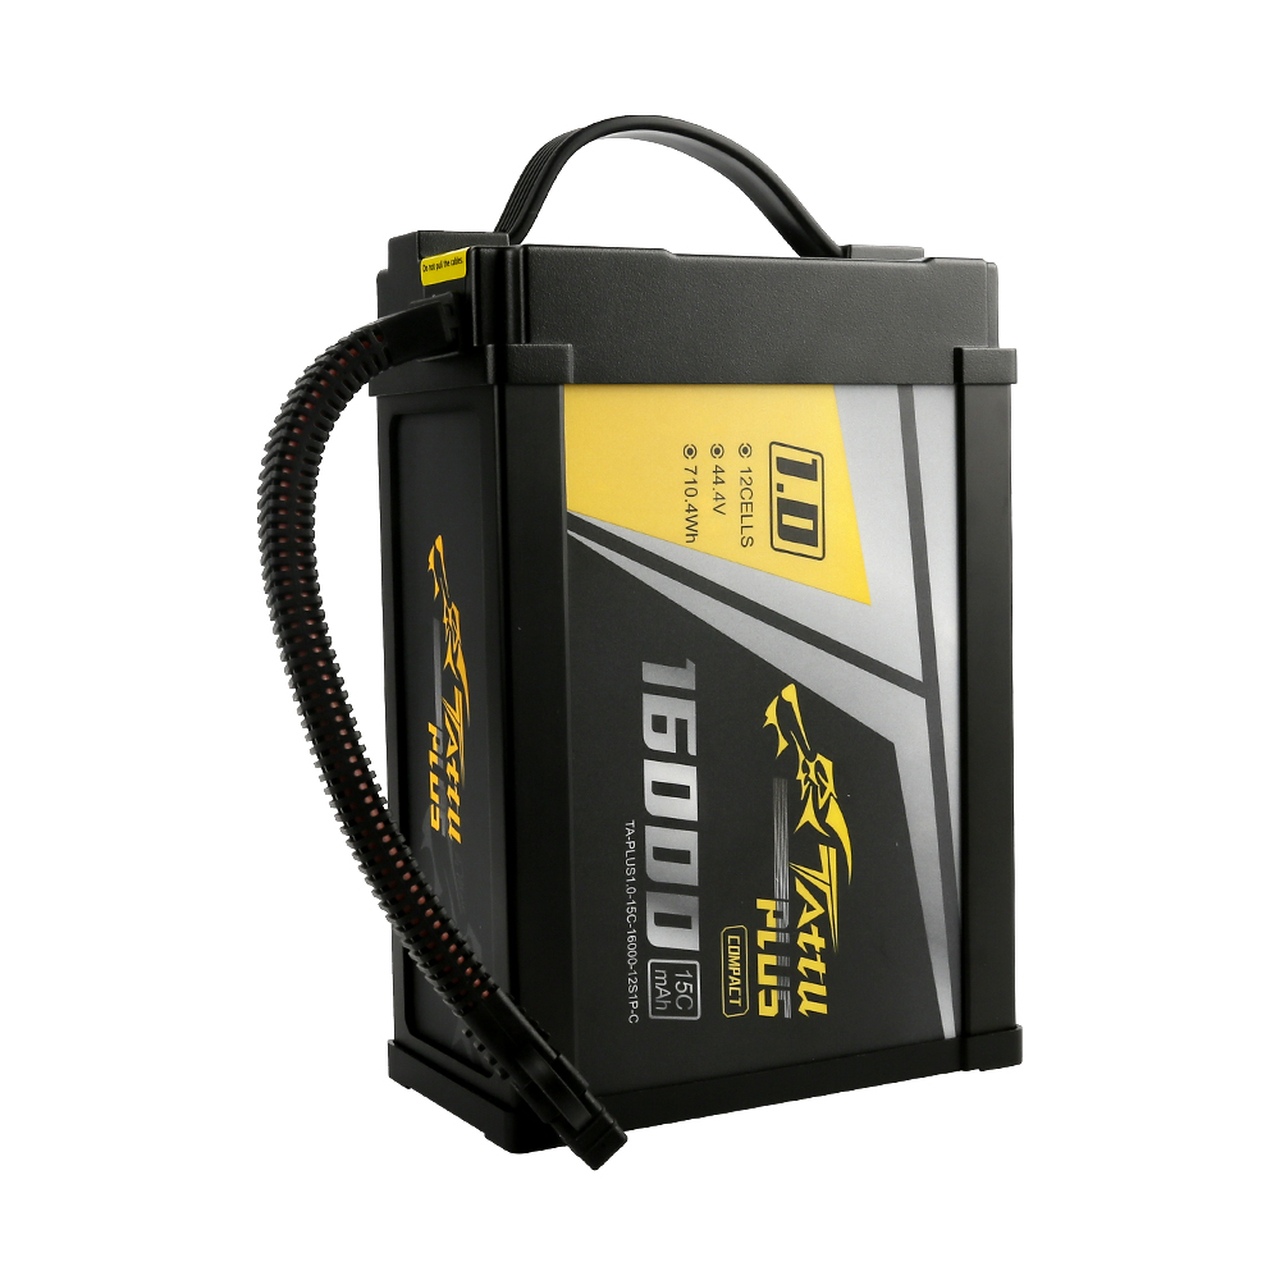 Tattu Plus 1.0 Compact Version 16000mAh 44.4V 15C 12S1P Lipo Smart Battery Pack with XT90-S Plug